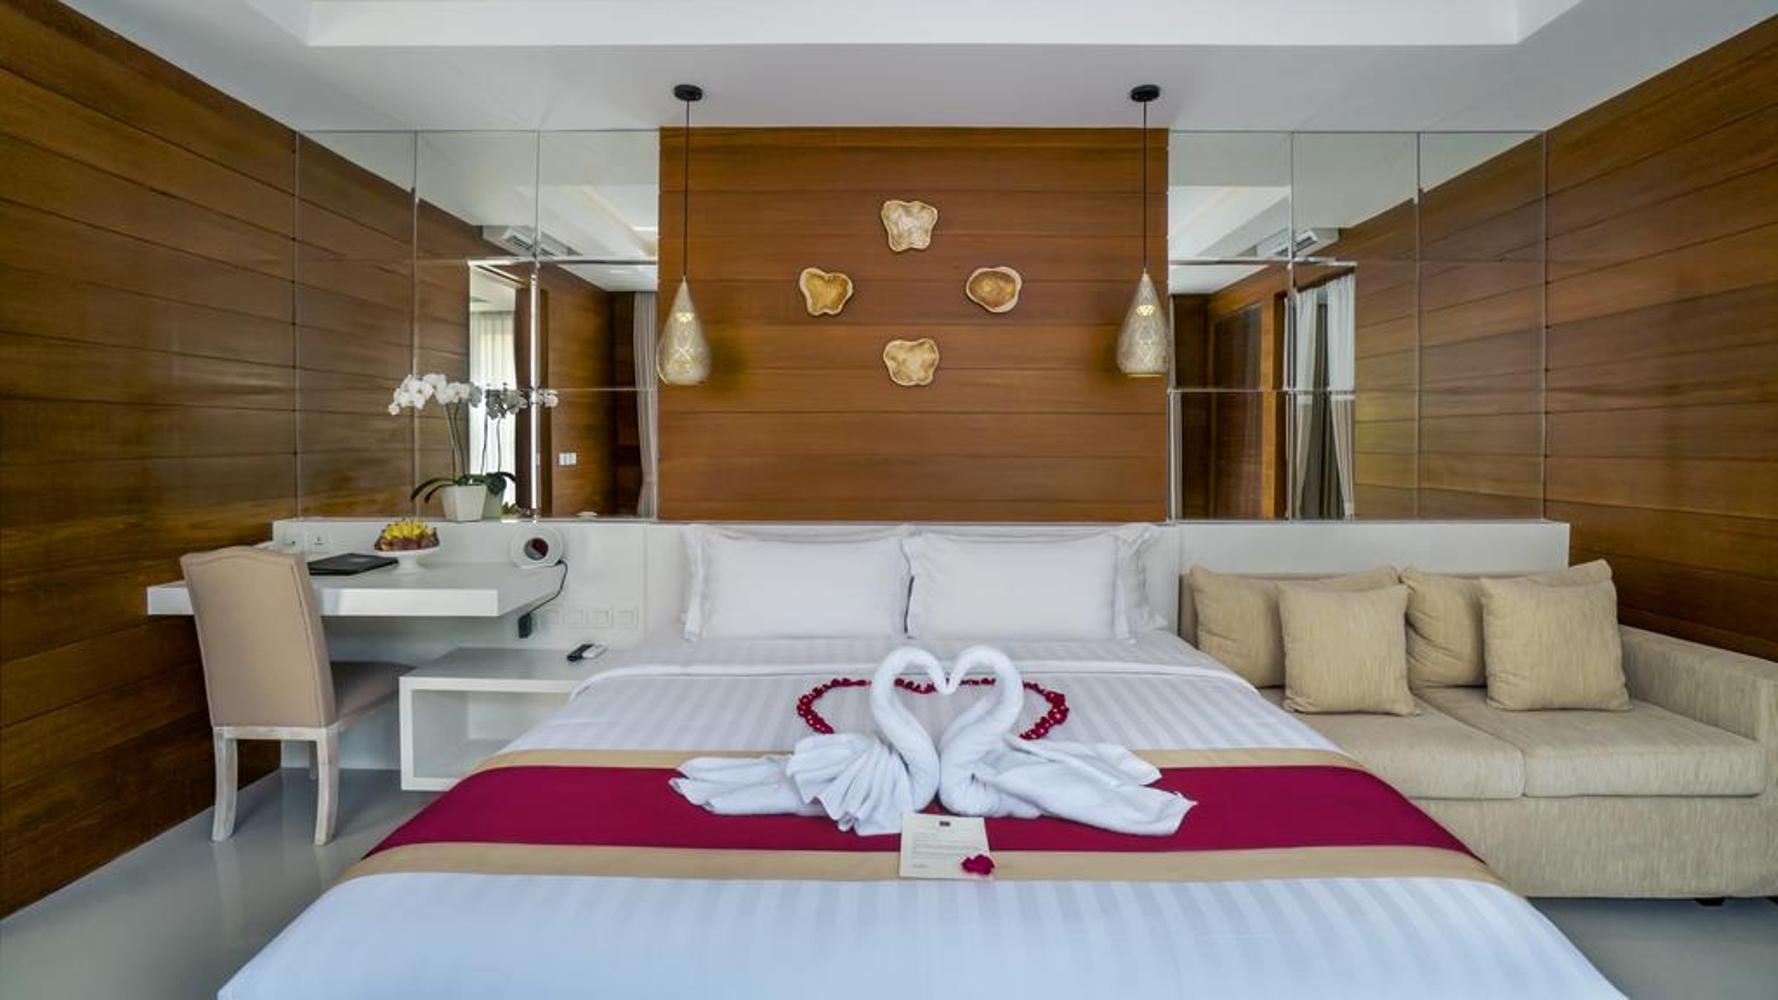 1 BR Villa With Private Pool+Brkfst @ 200 Seminyak